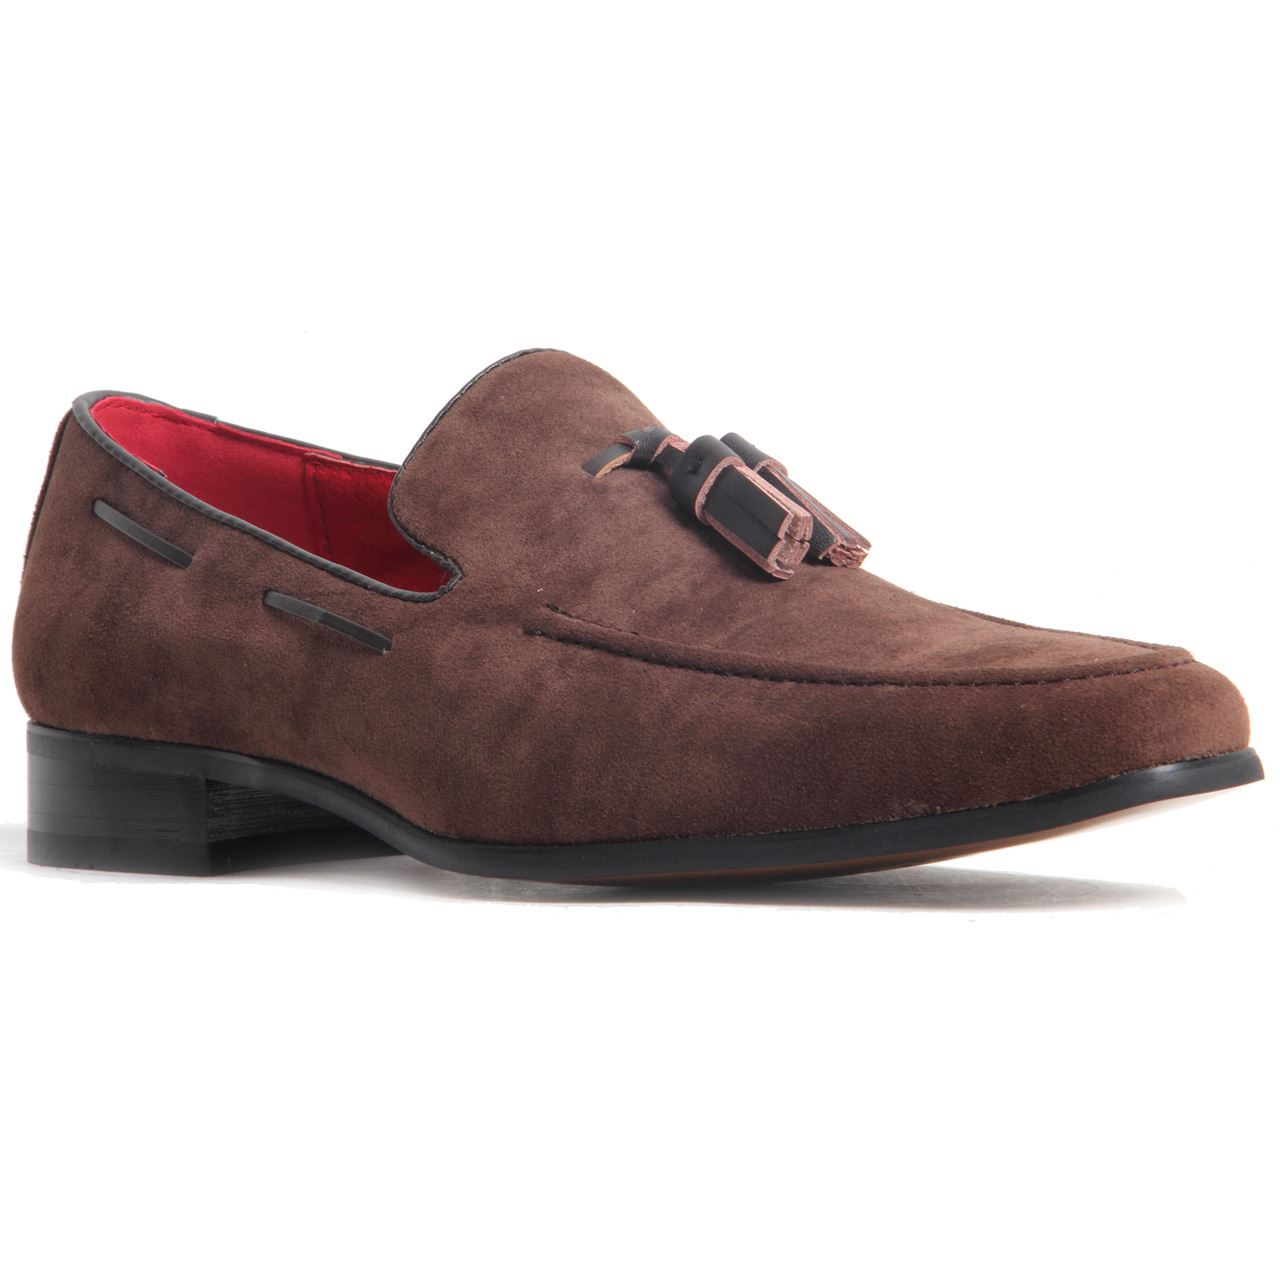 Men 39 S Slip On Tassel Loafers Suede Leather Lined Heel